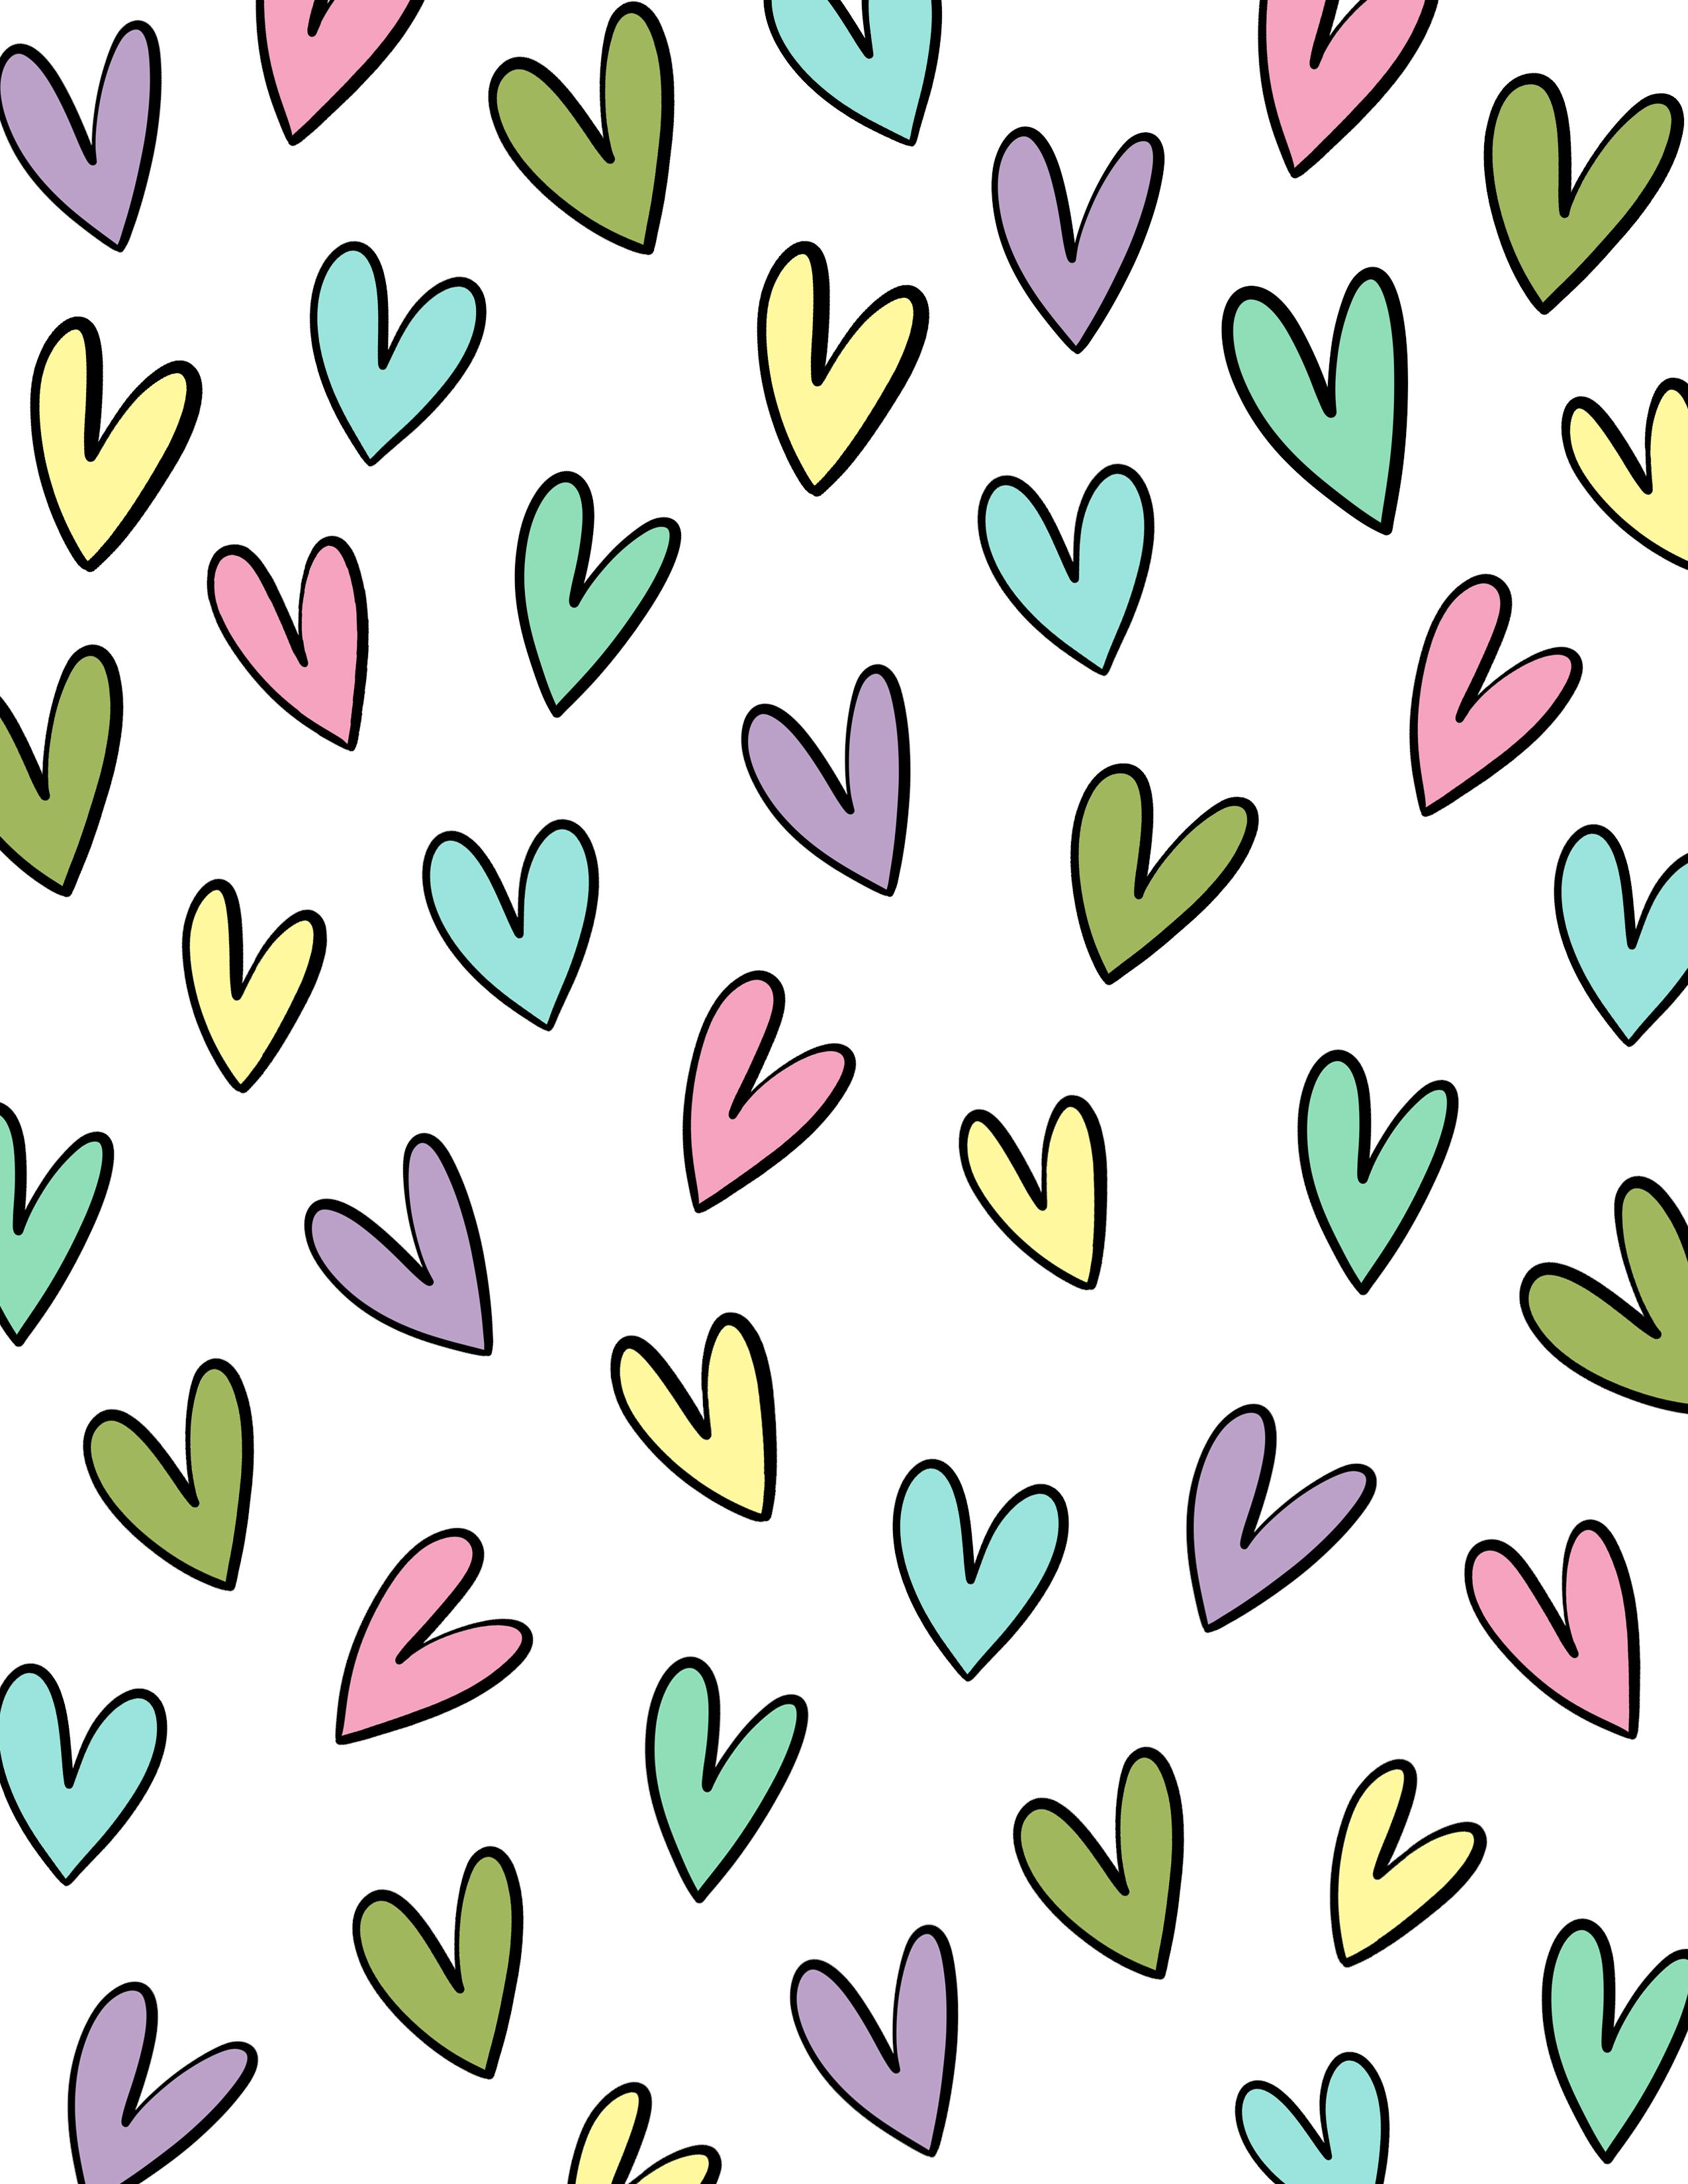 Cute Hearts Wallpapers Heart Wallpaper Cute Wallpapers Fractal Art